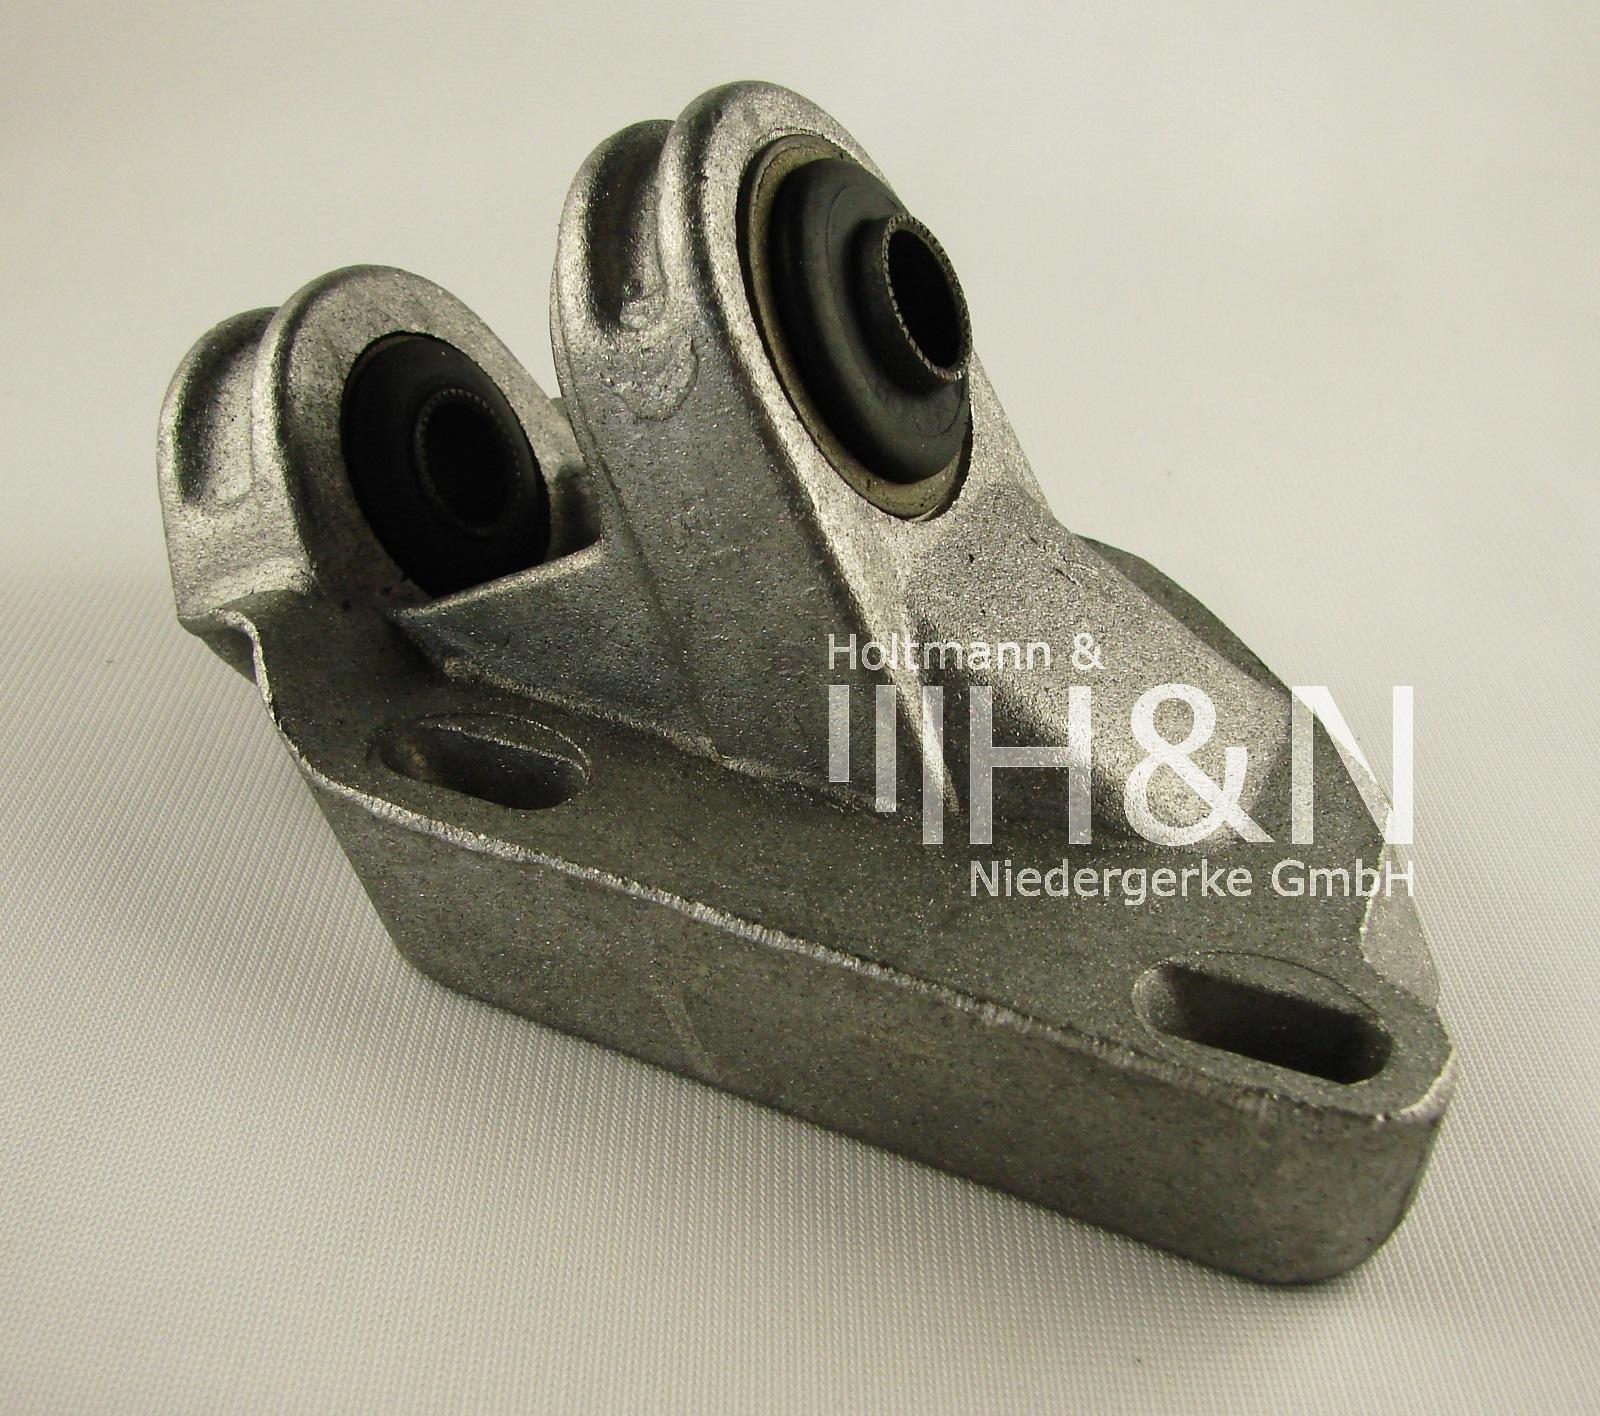 Steering Idler Fiat 500 600 850 W O Arm